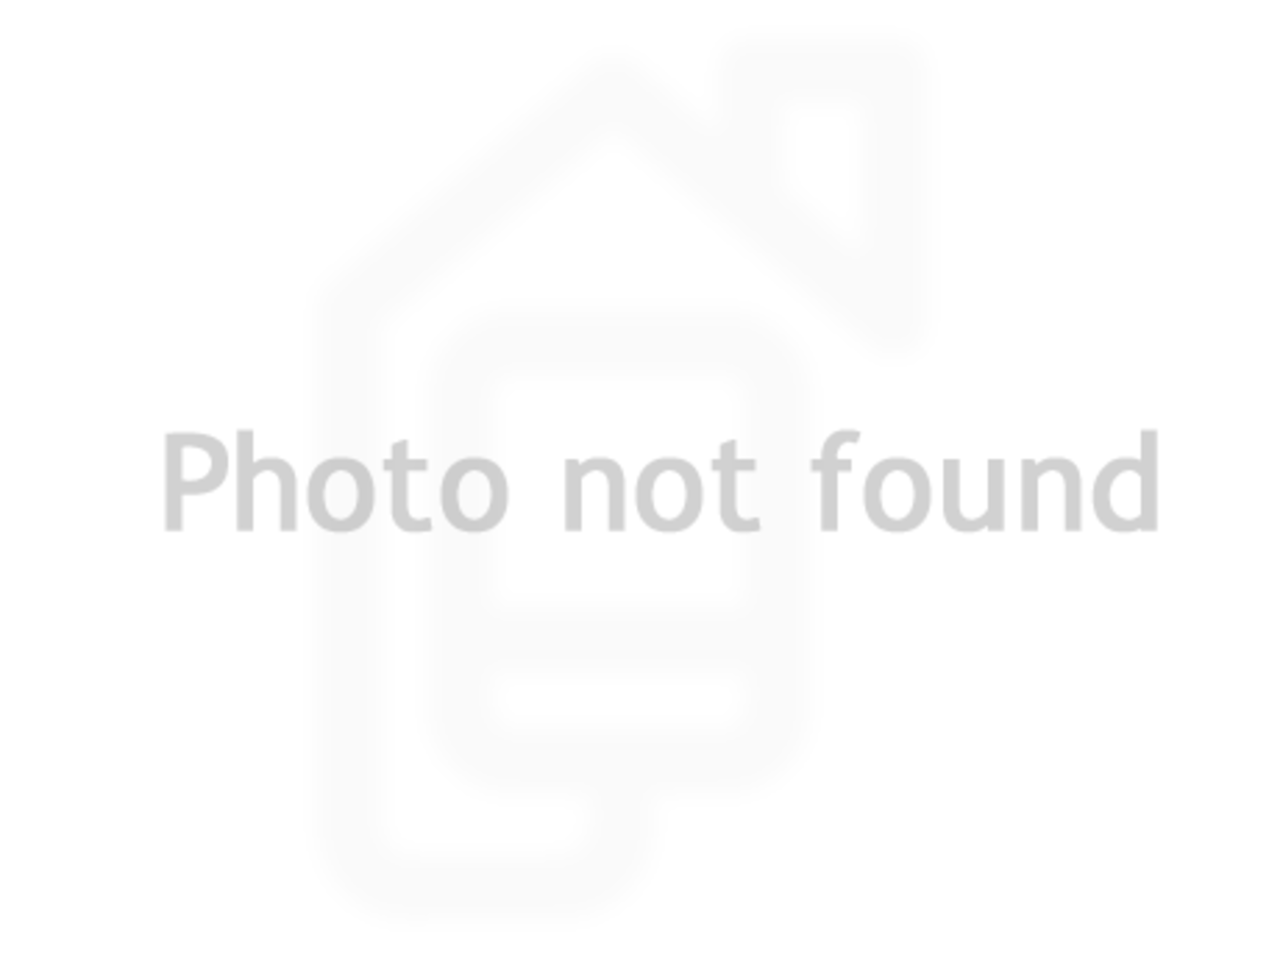 Citation club pet friendly apartment delray beach fl - 3 bedroom pet friendly apartments ...